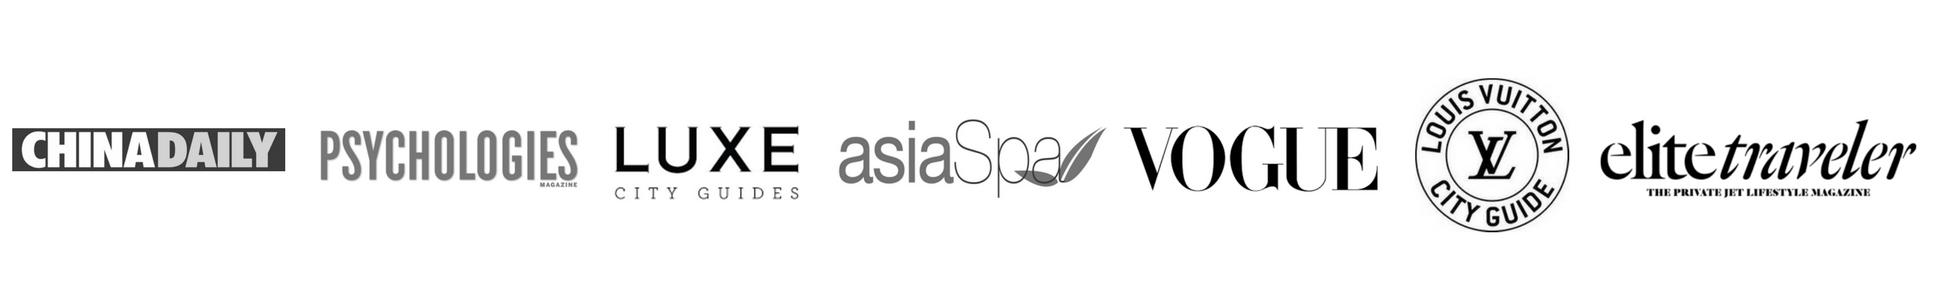 Award Winning Spa Business Kocoon Spa China